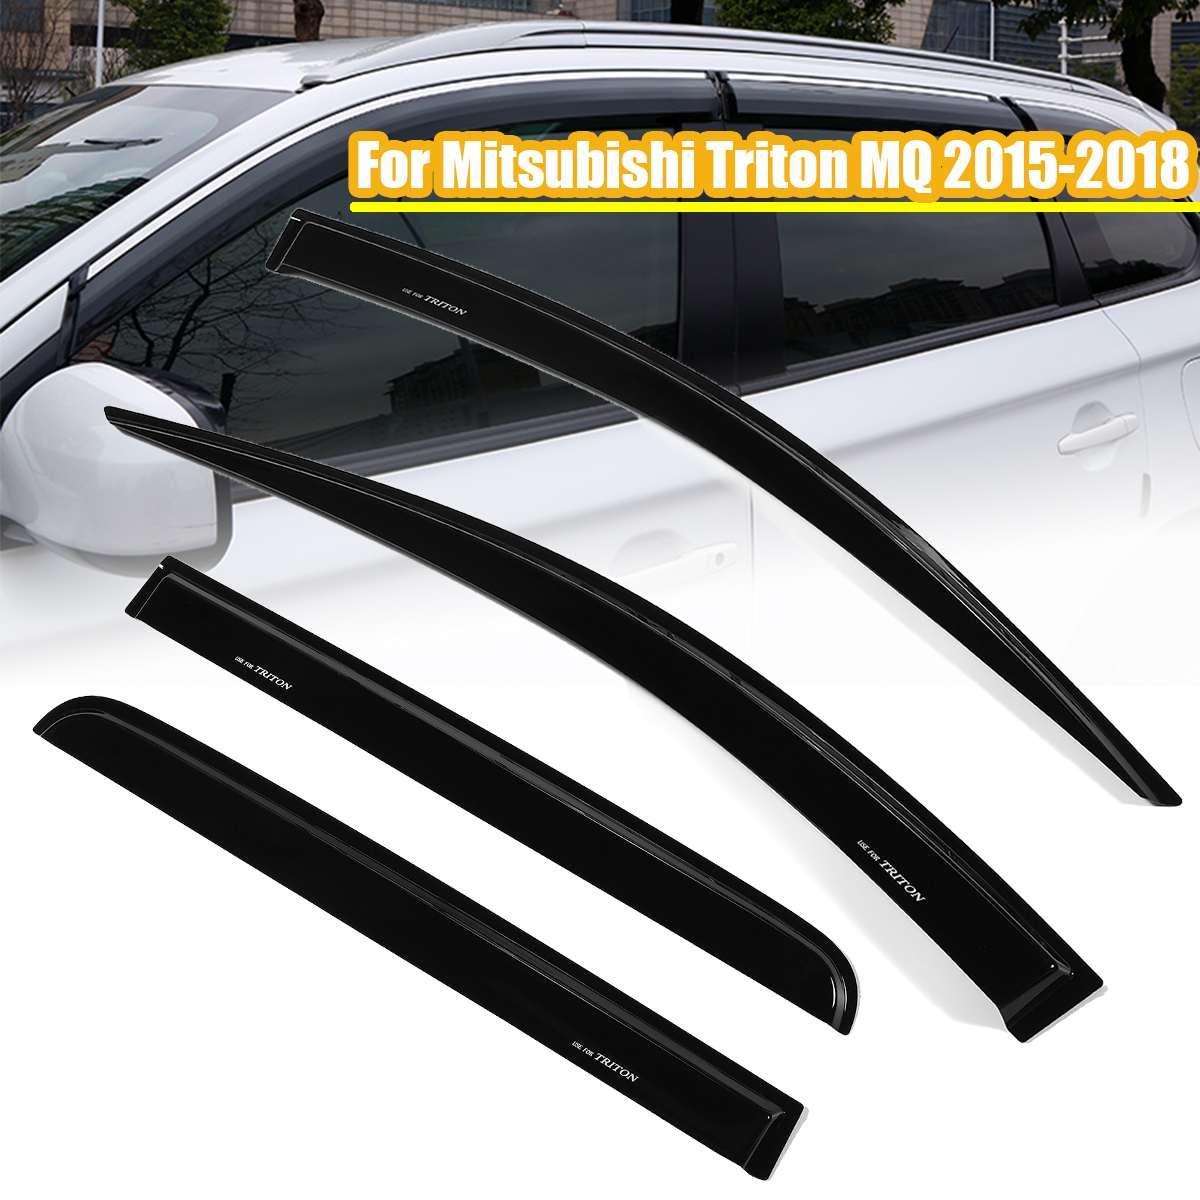 4pcs Rain Window Visor Weather Shields Guards For Mitsubishi Triton MQ 2015 18 Car Window Deflectors